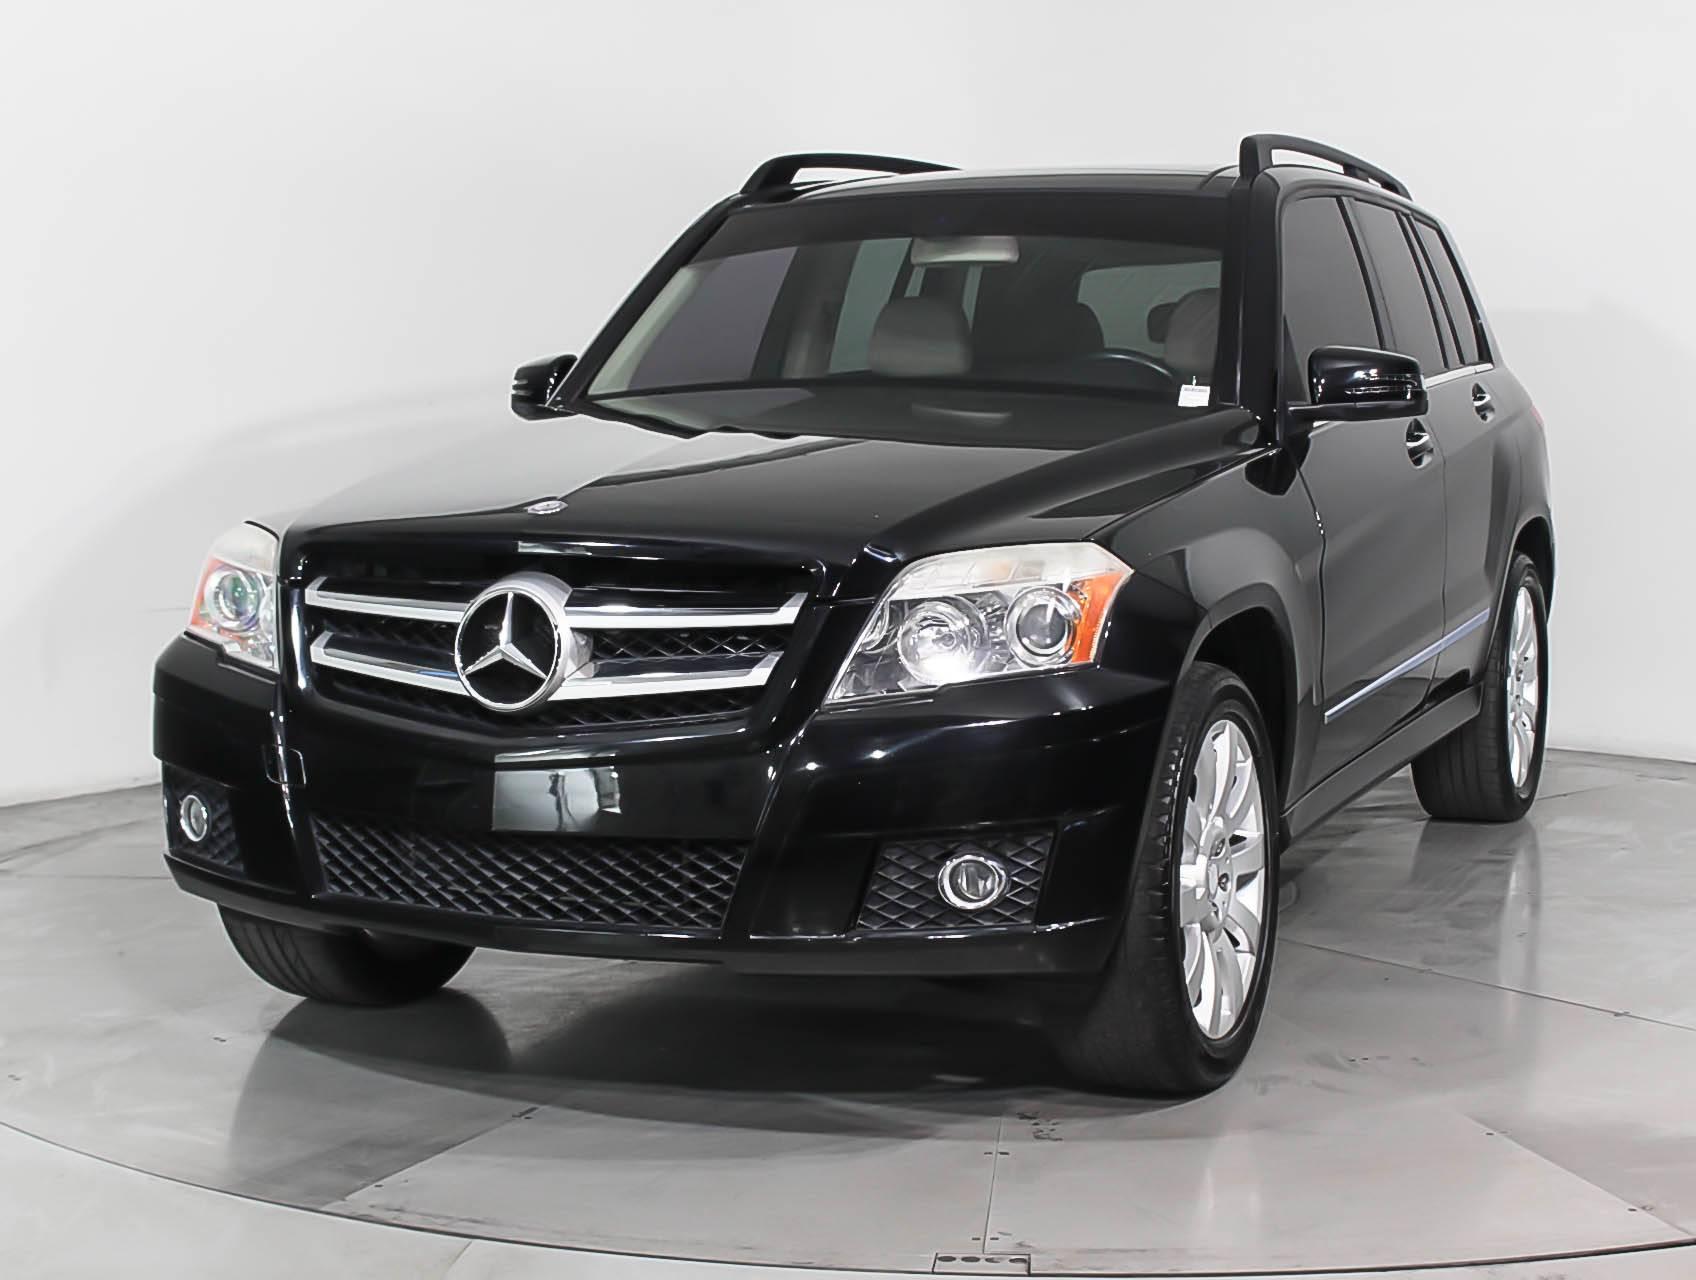 2012 Mercedes Glk350 >> Used 2012 Mercedes Benz Glk Class Glk350 Suv For Sale In